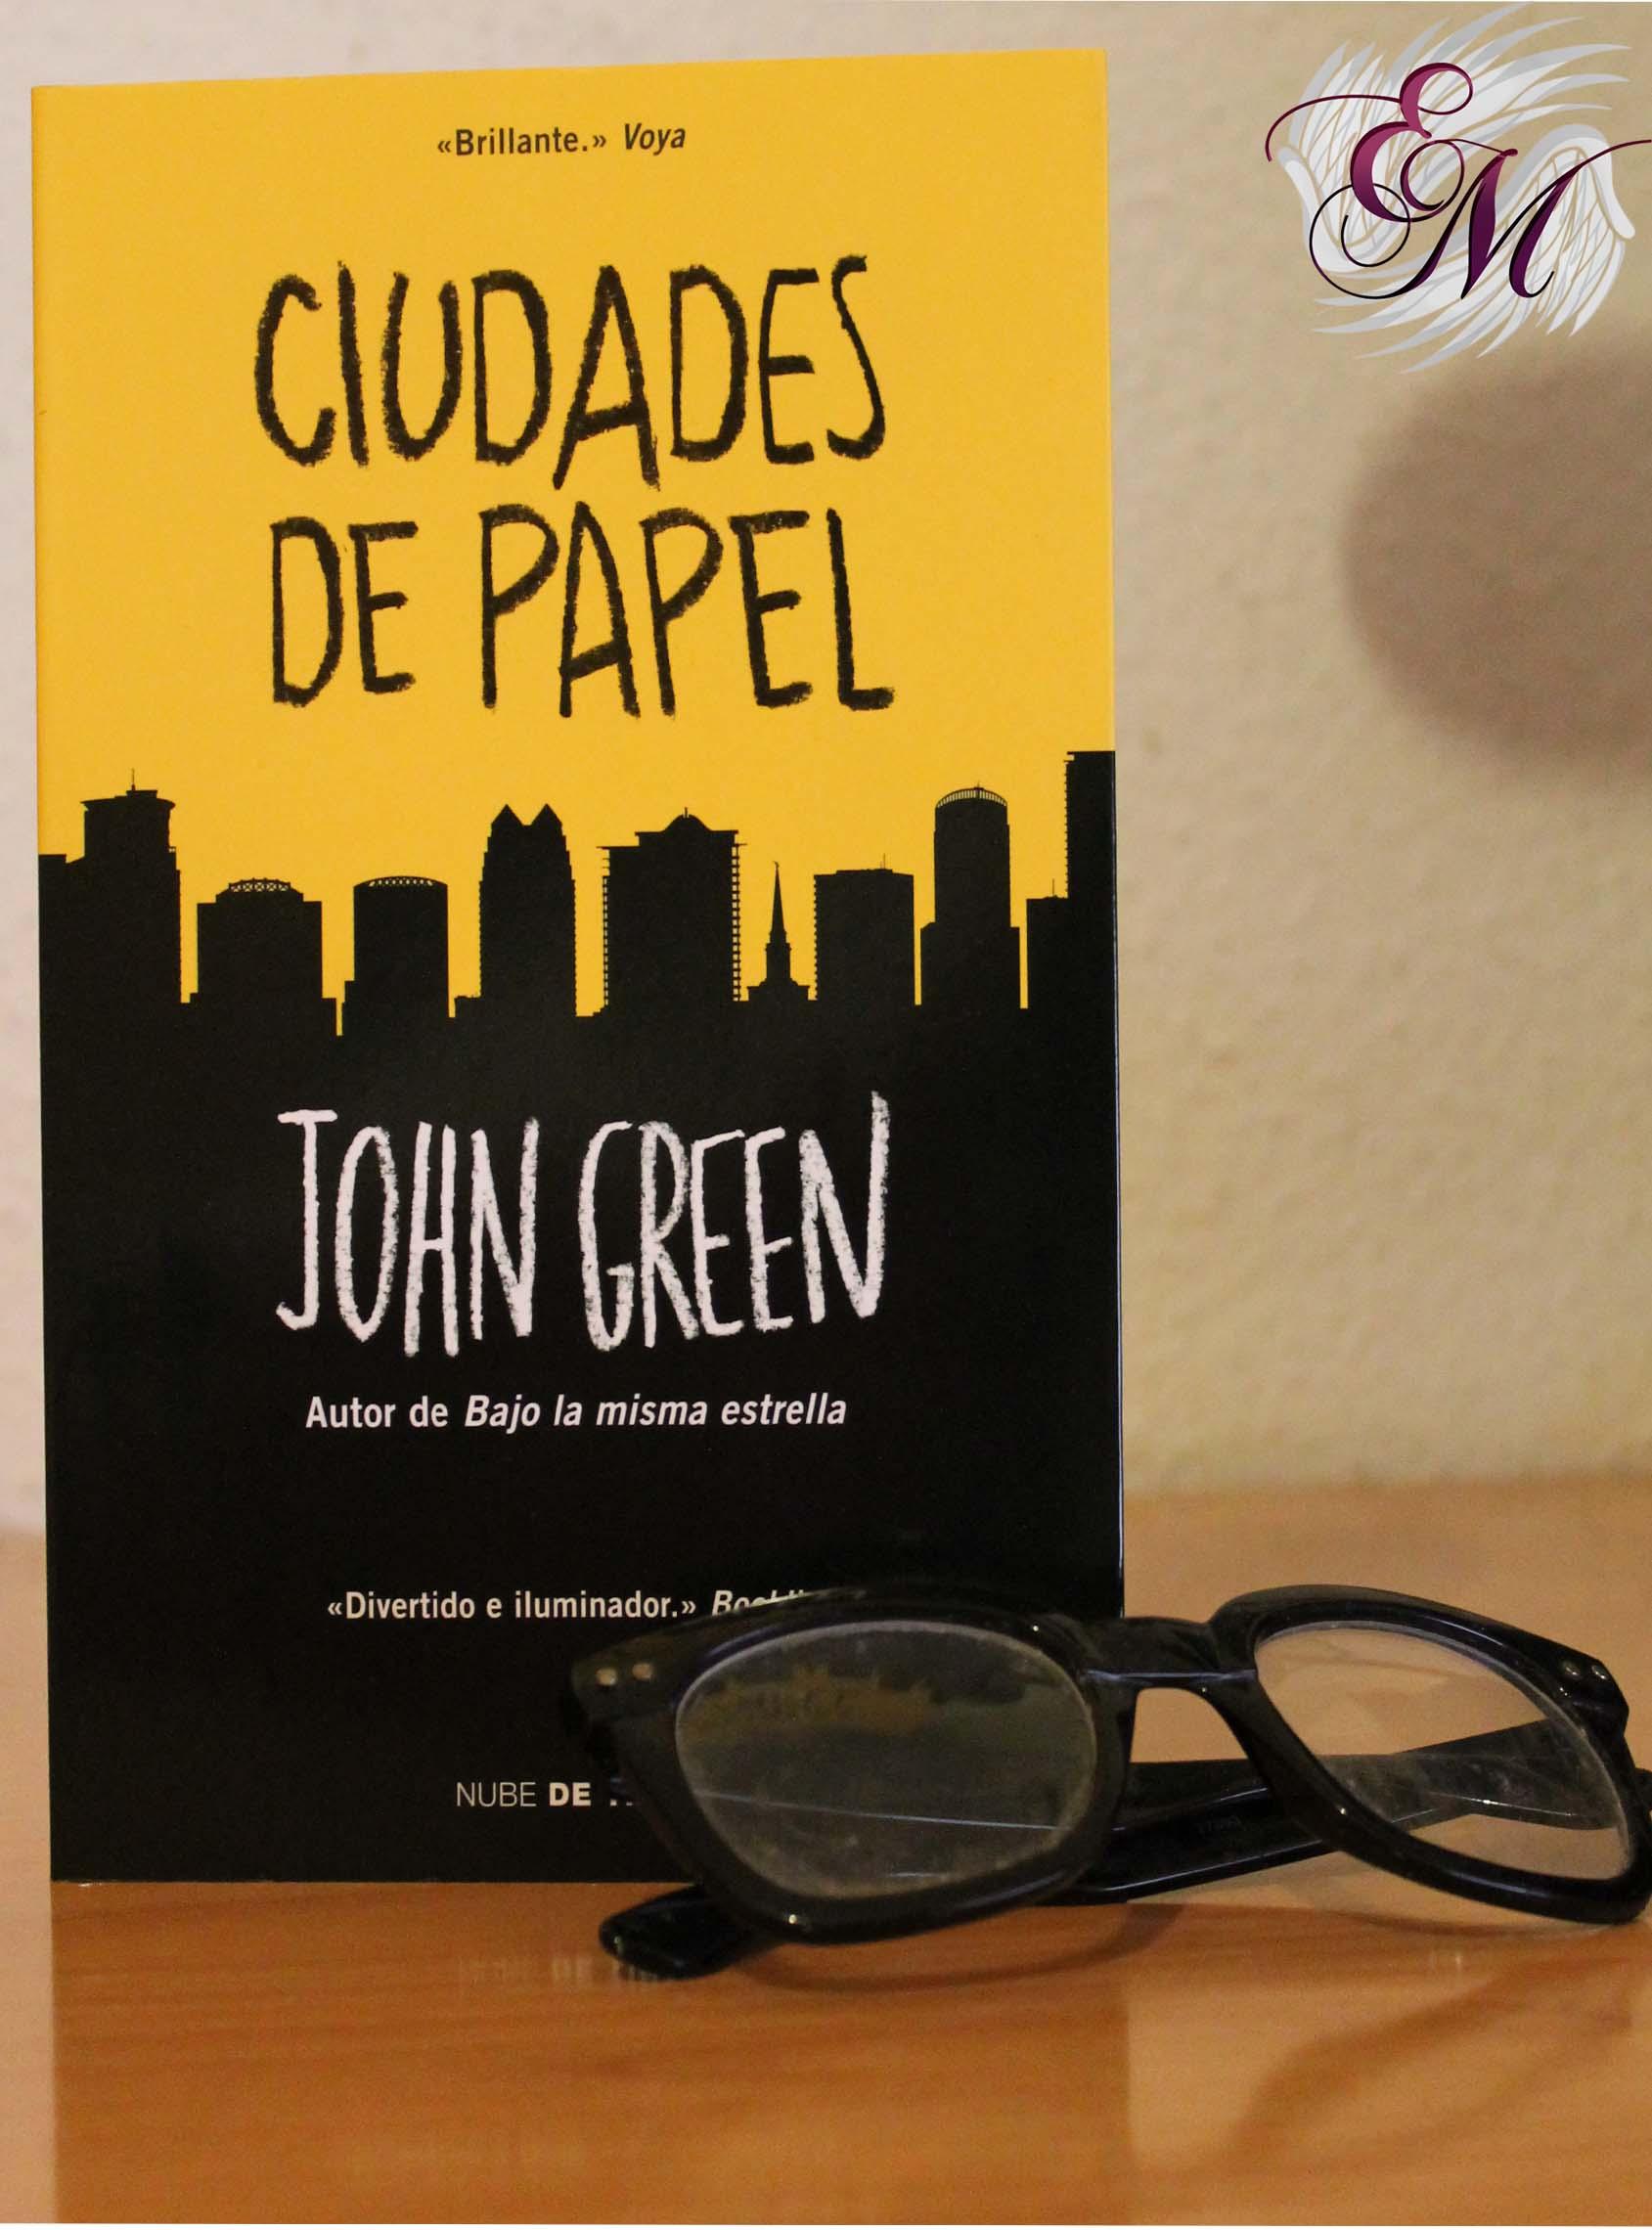 Foto de la portada del libro.